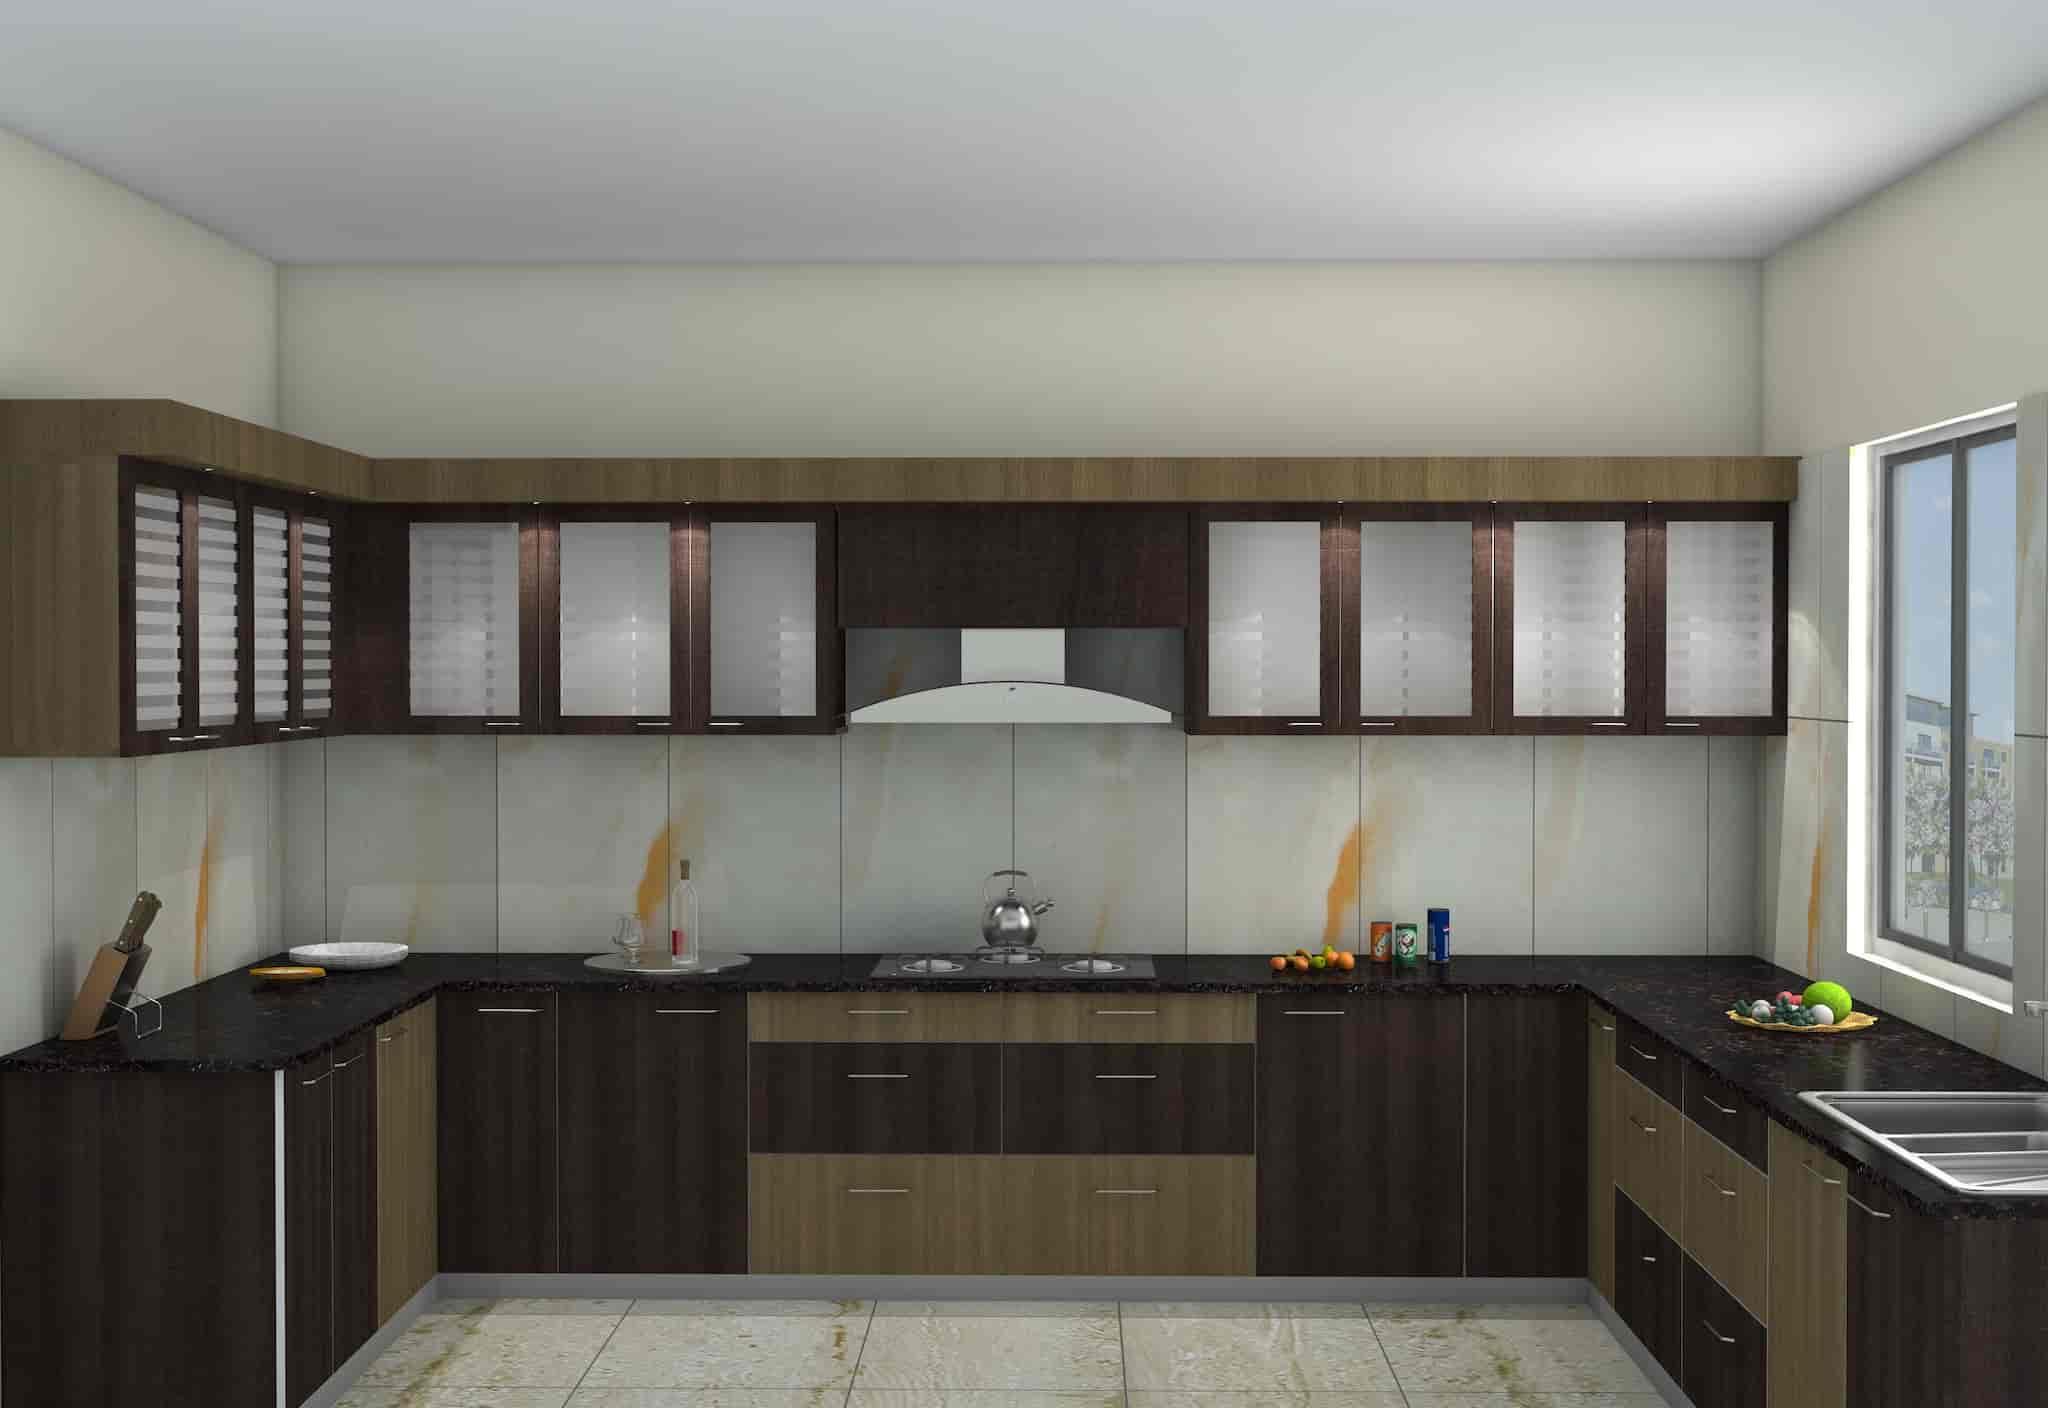 Kitchen gallery moni interior bapuji nagar interior designers in bhubaneshwar justdial